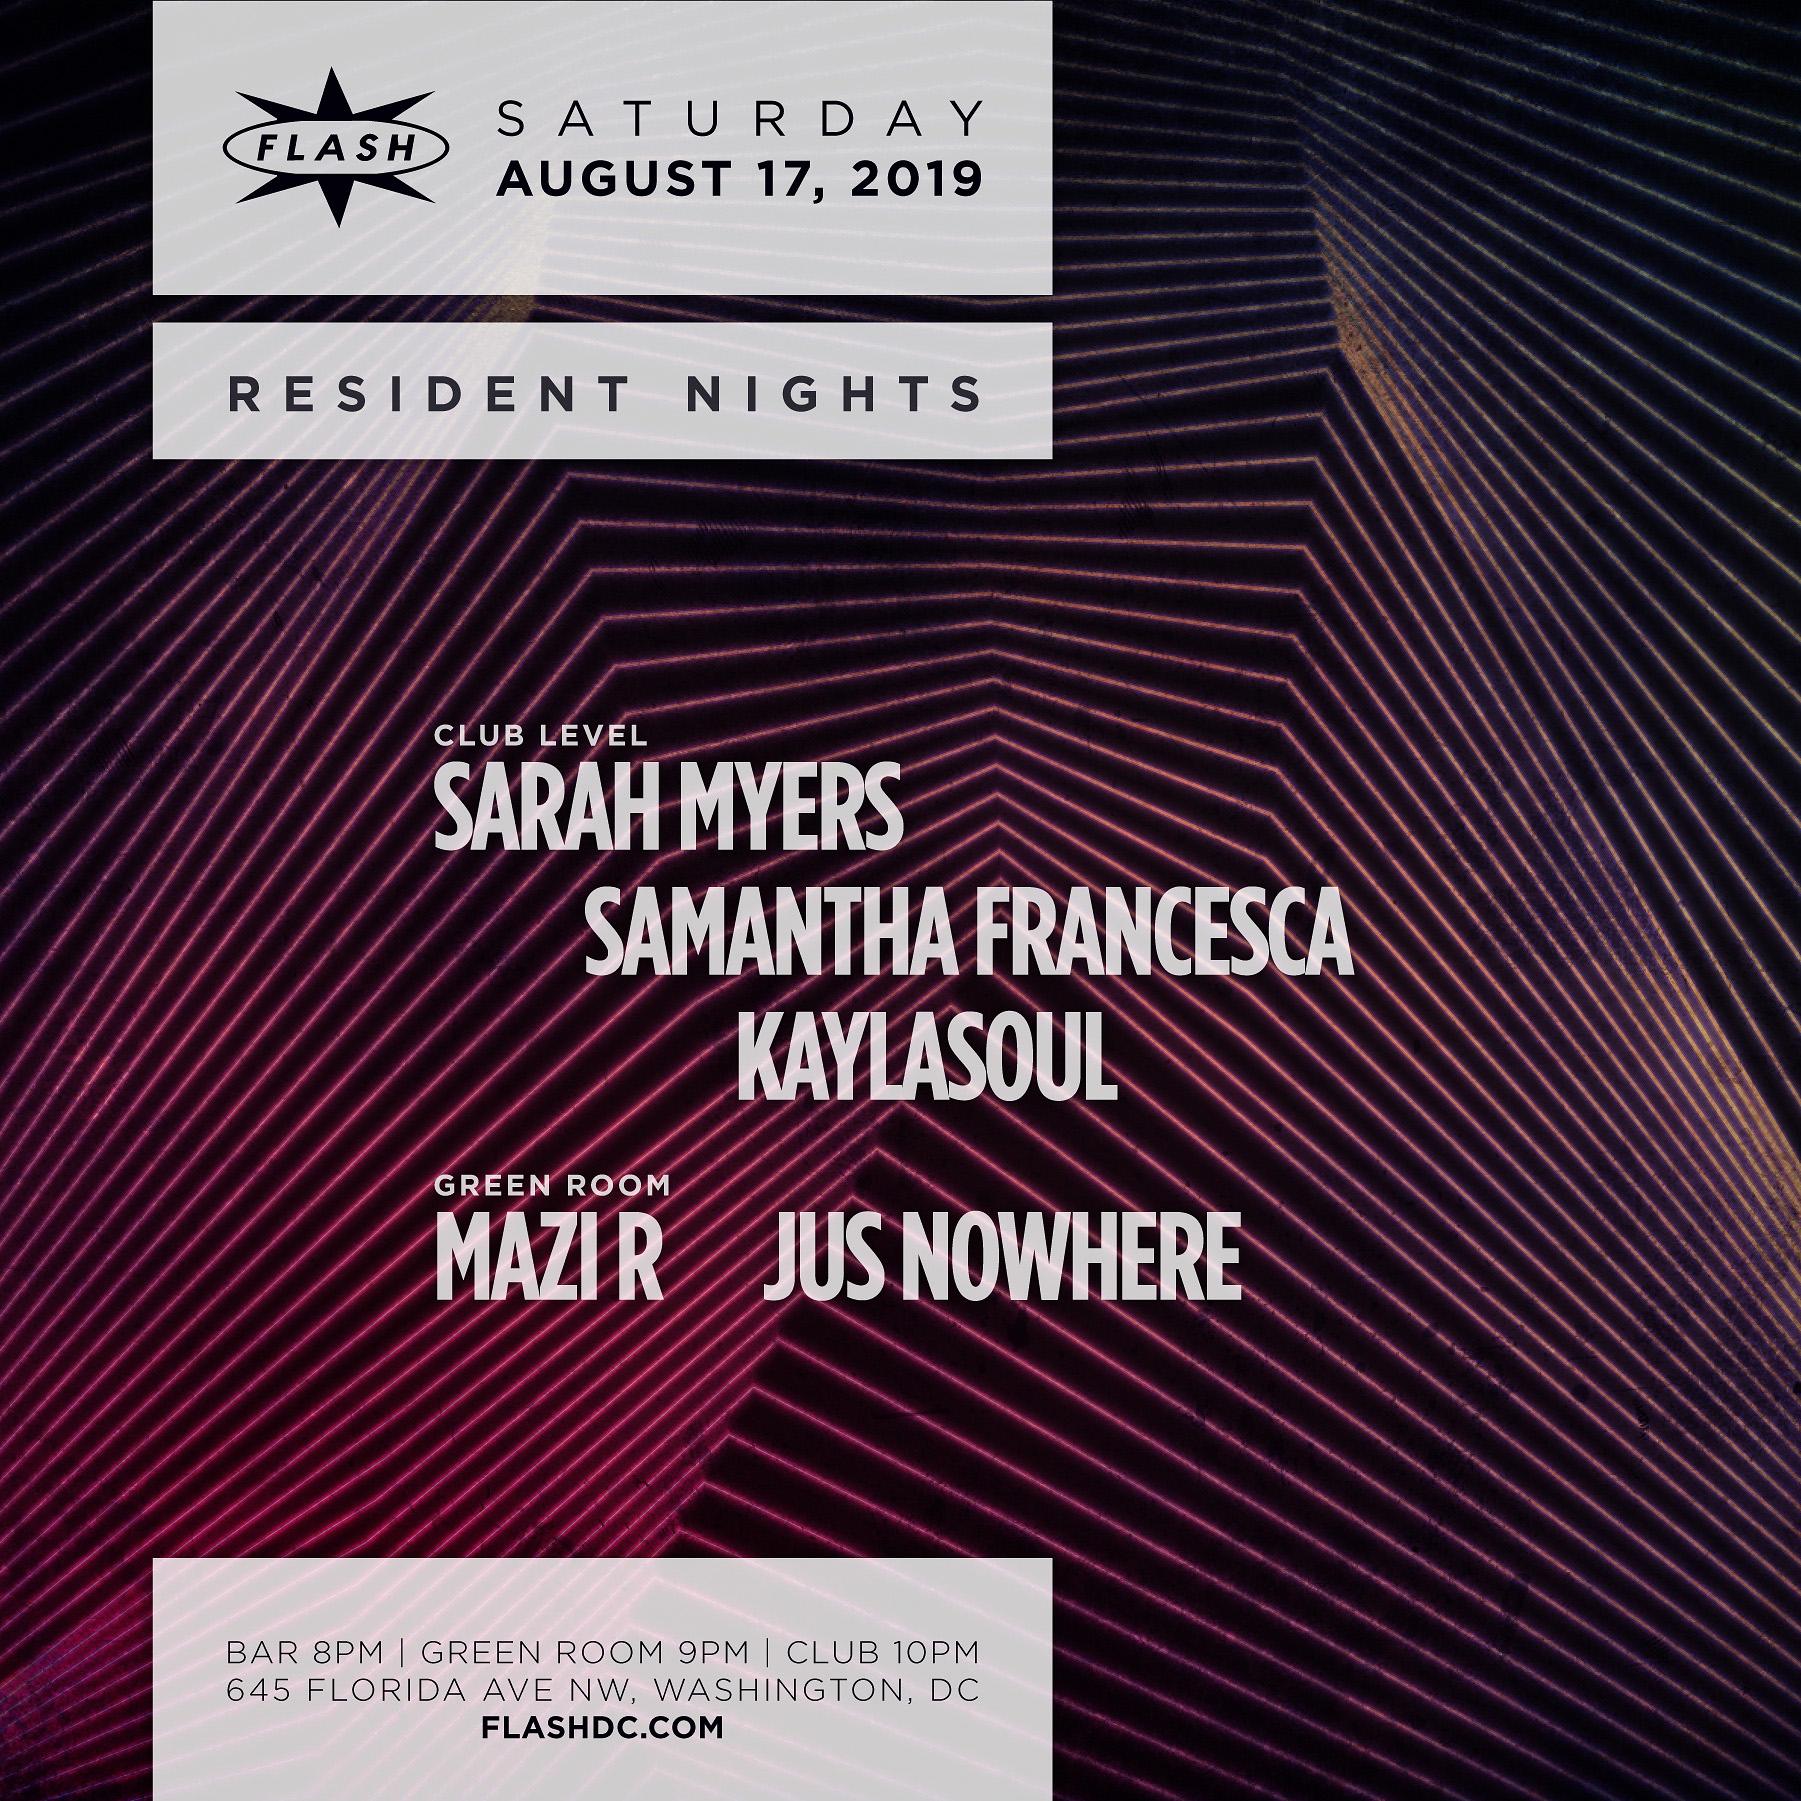 Flash: Nightclub and Bar - Washington DC